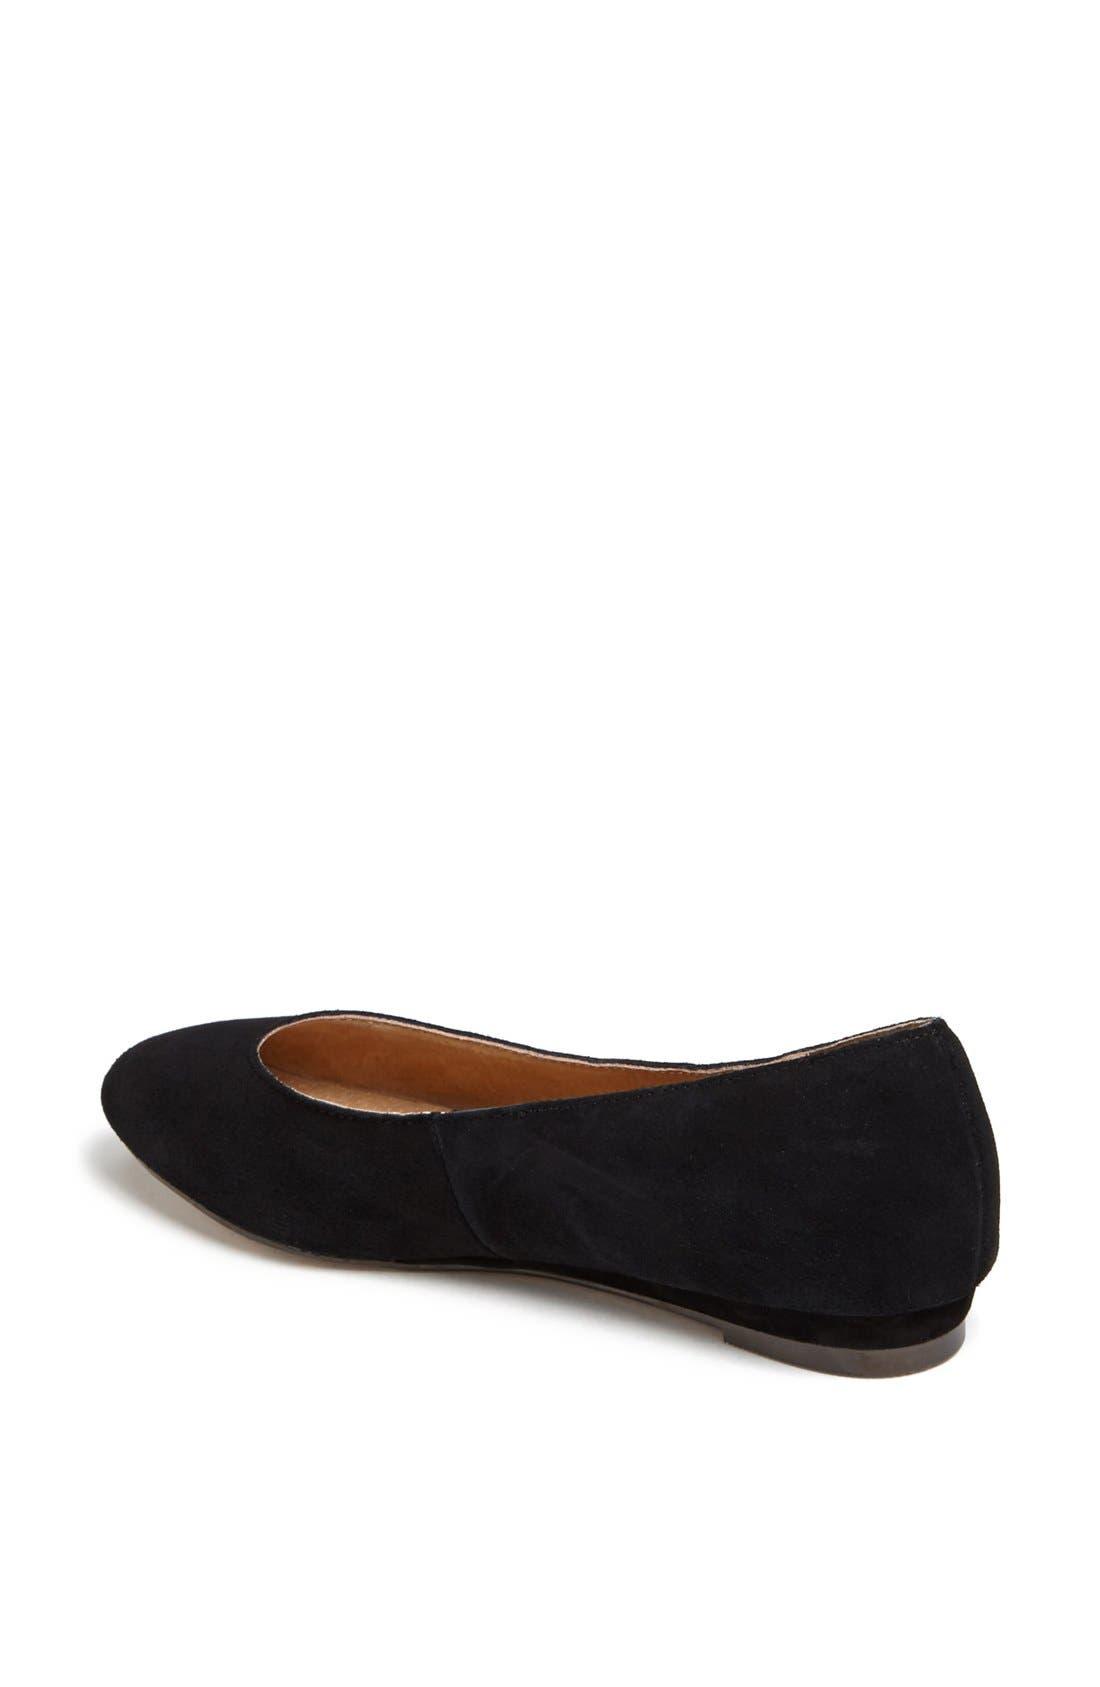 'Mello Mini Wedge' Court Shoe,                             Alternate thumbnail 4, color,                             001